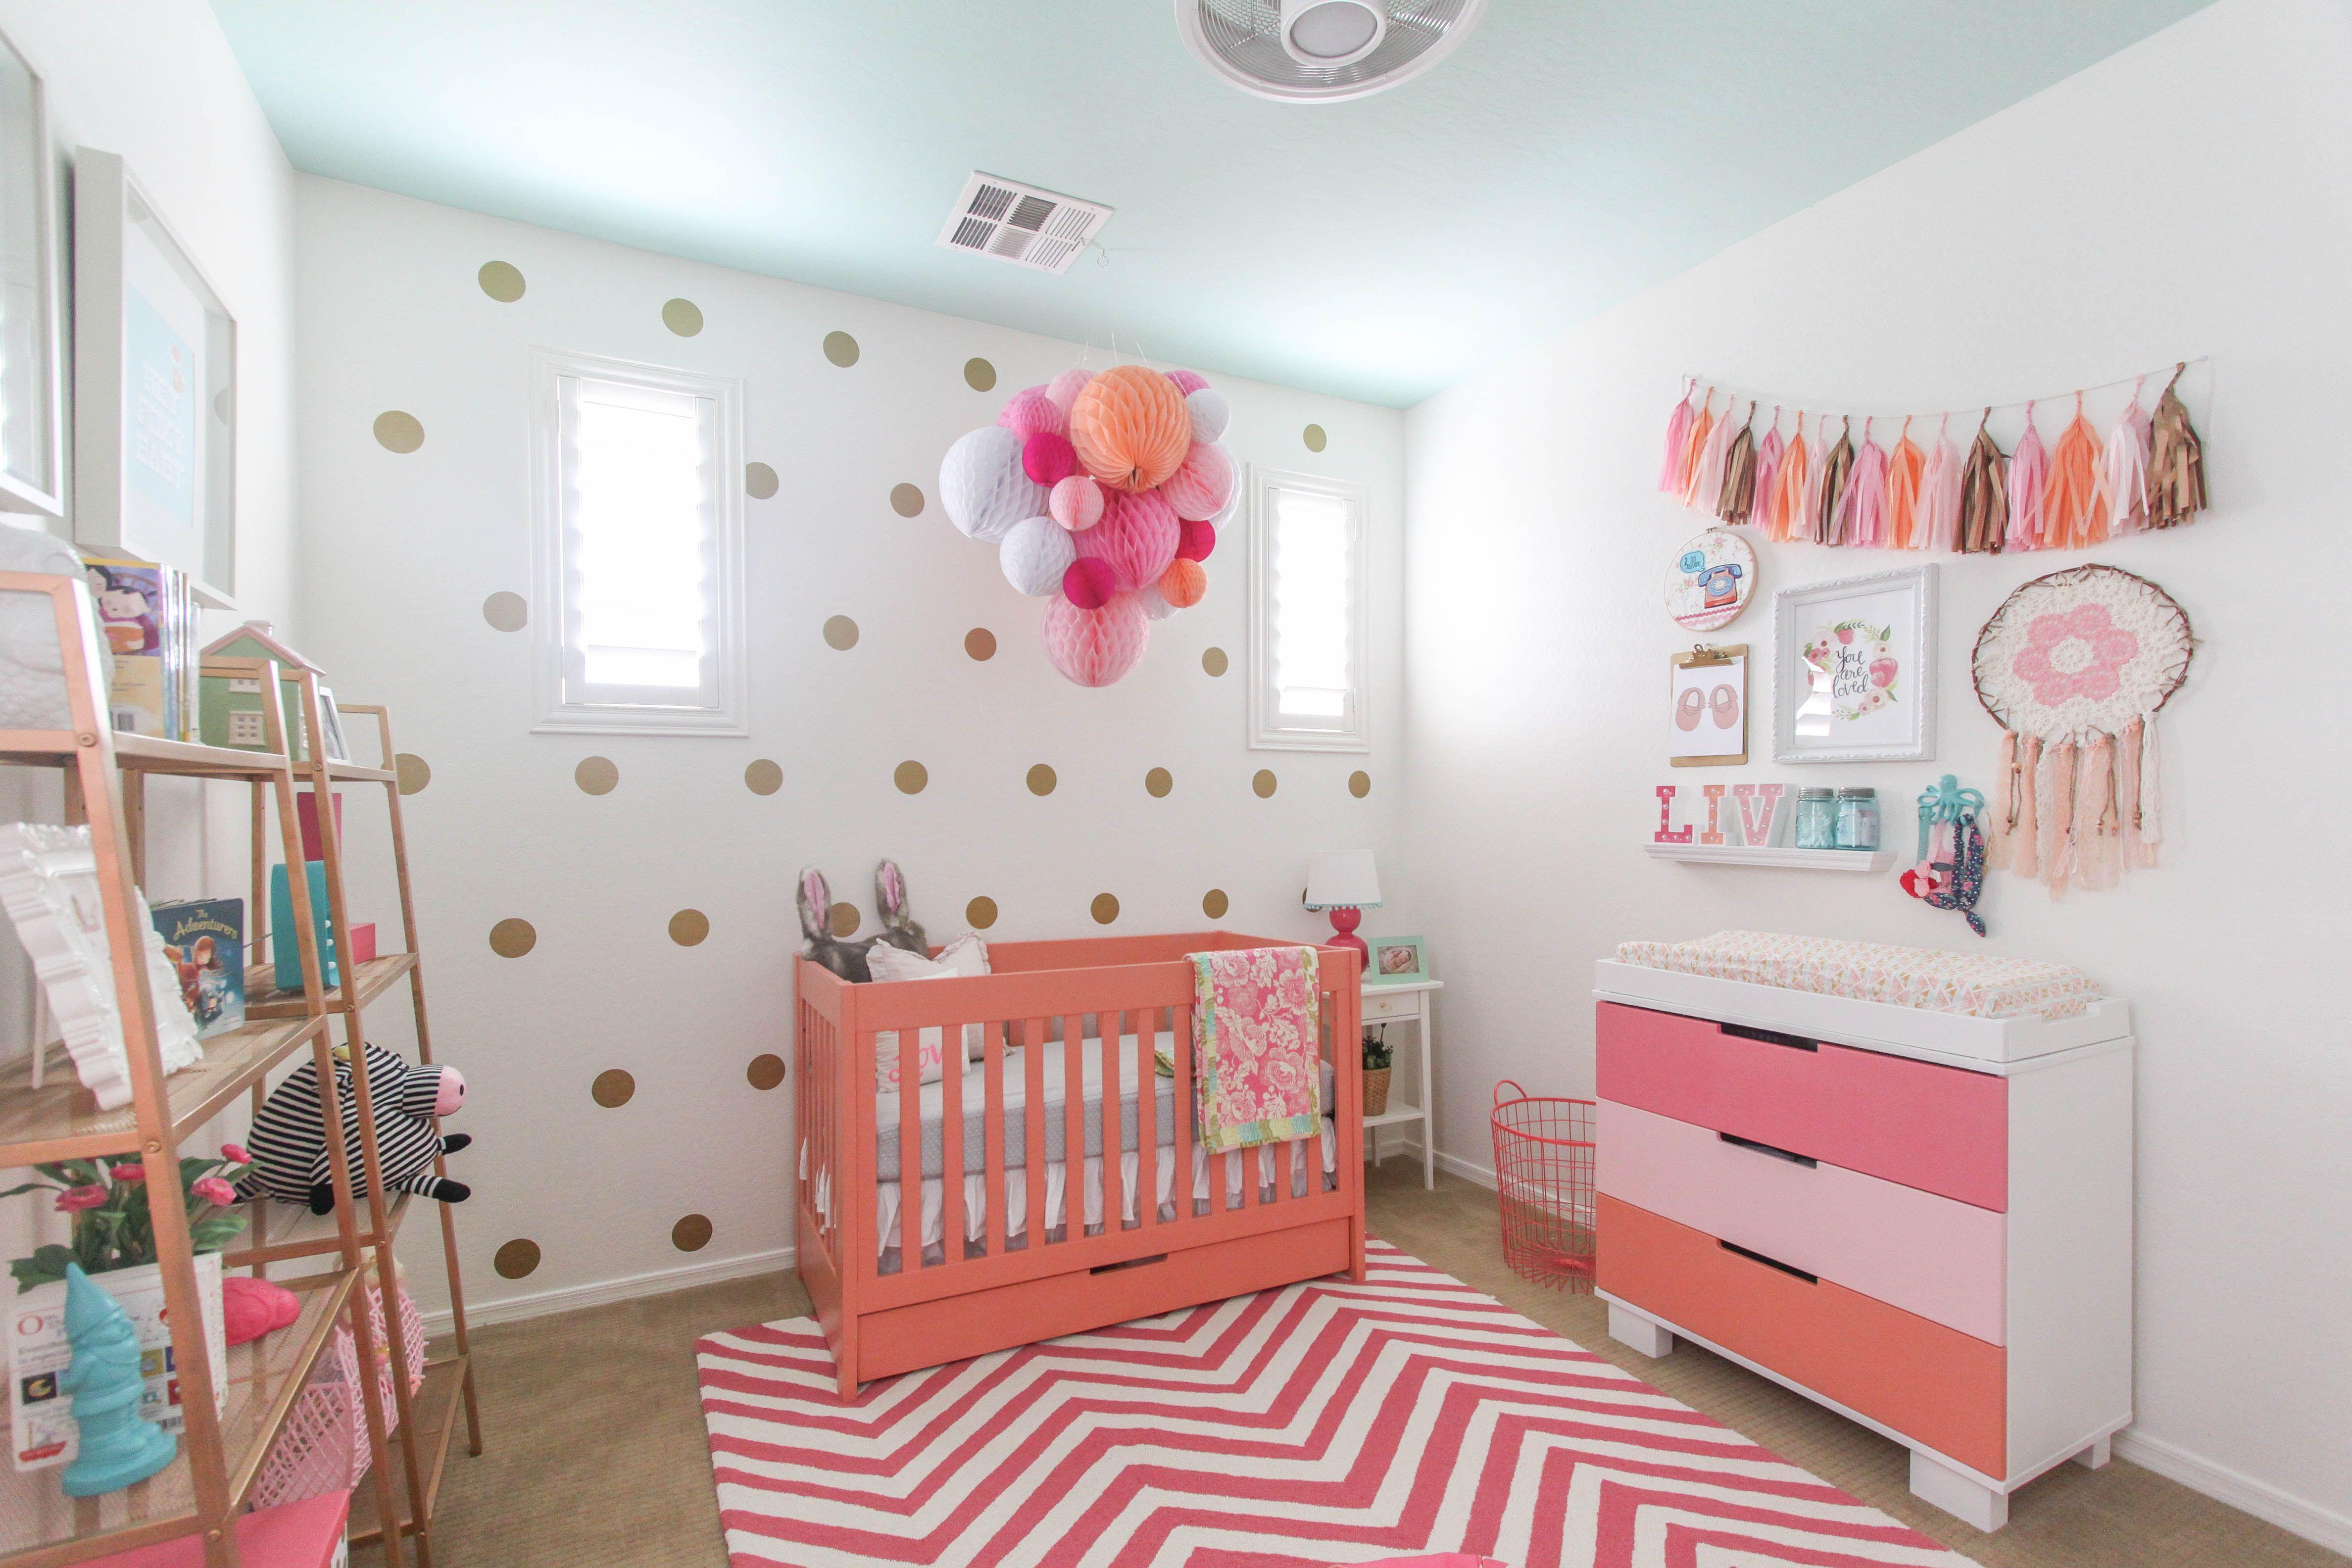 Design Reveal: Boho Chic Nursery | Project nursery and Nursery